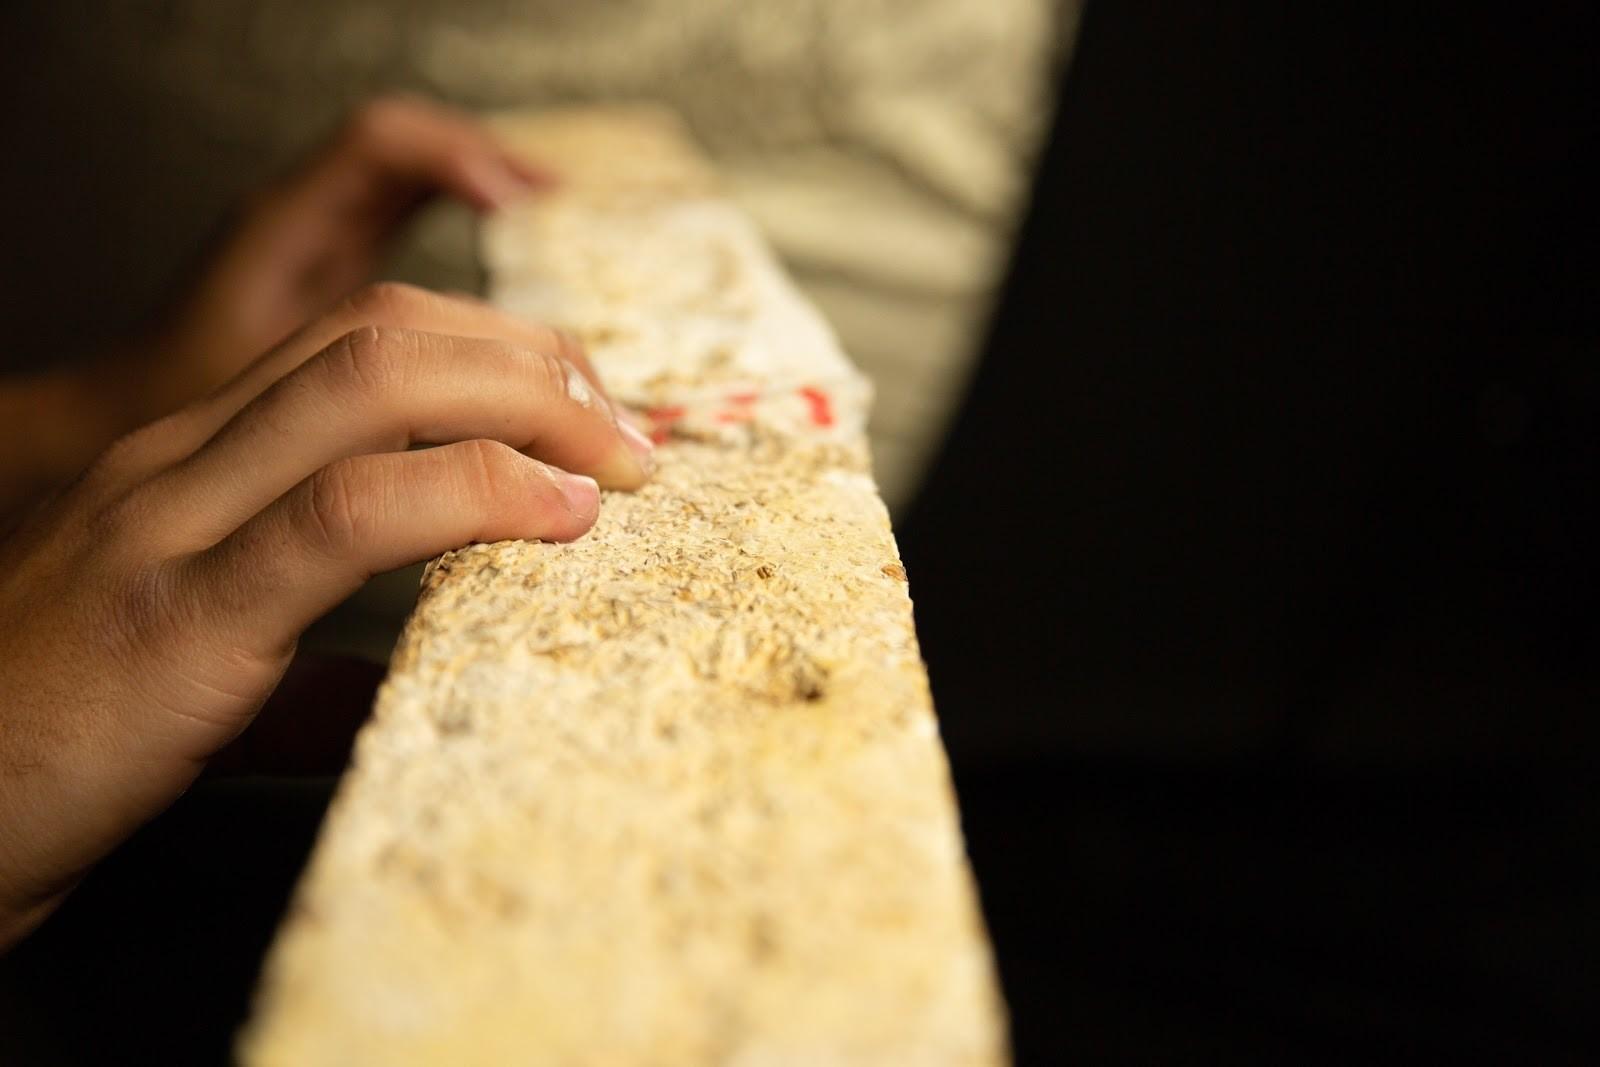 image of one of Biohm's mycelium insulation panels.